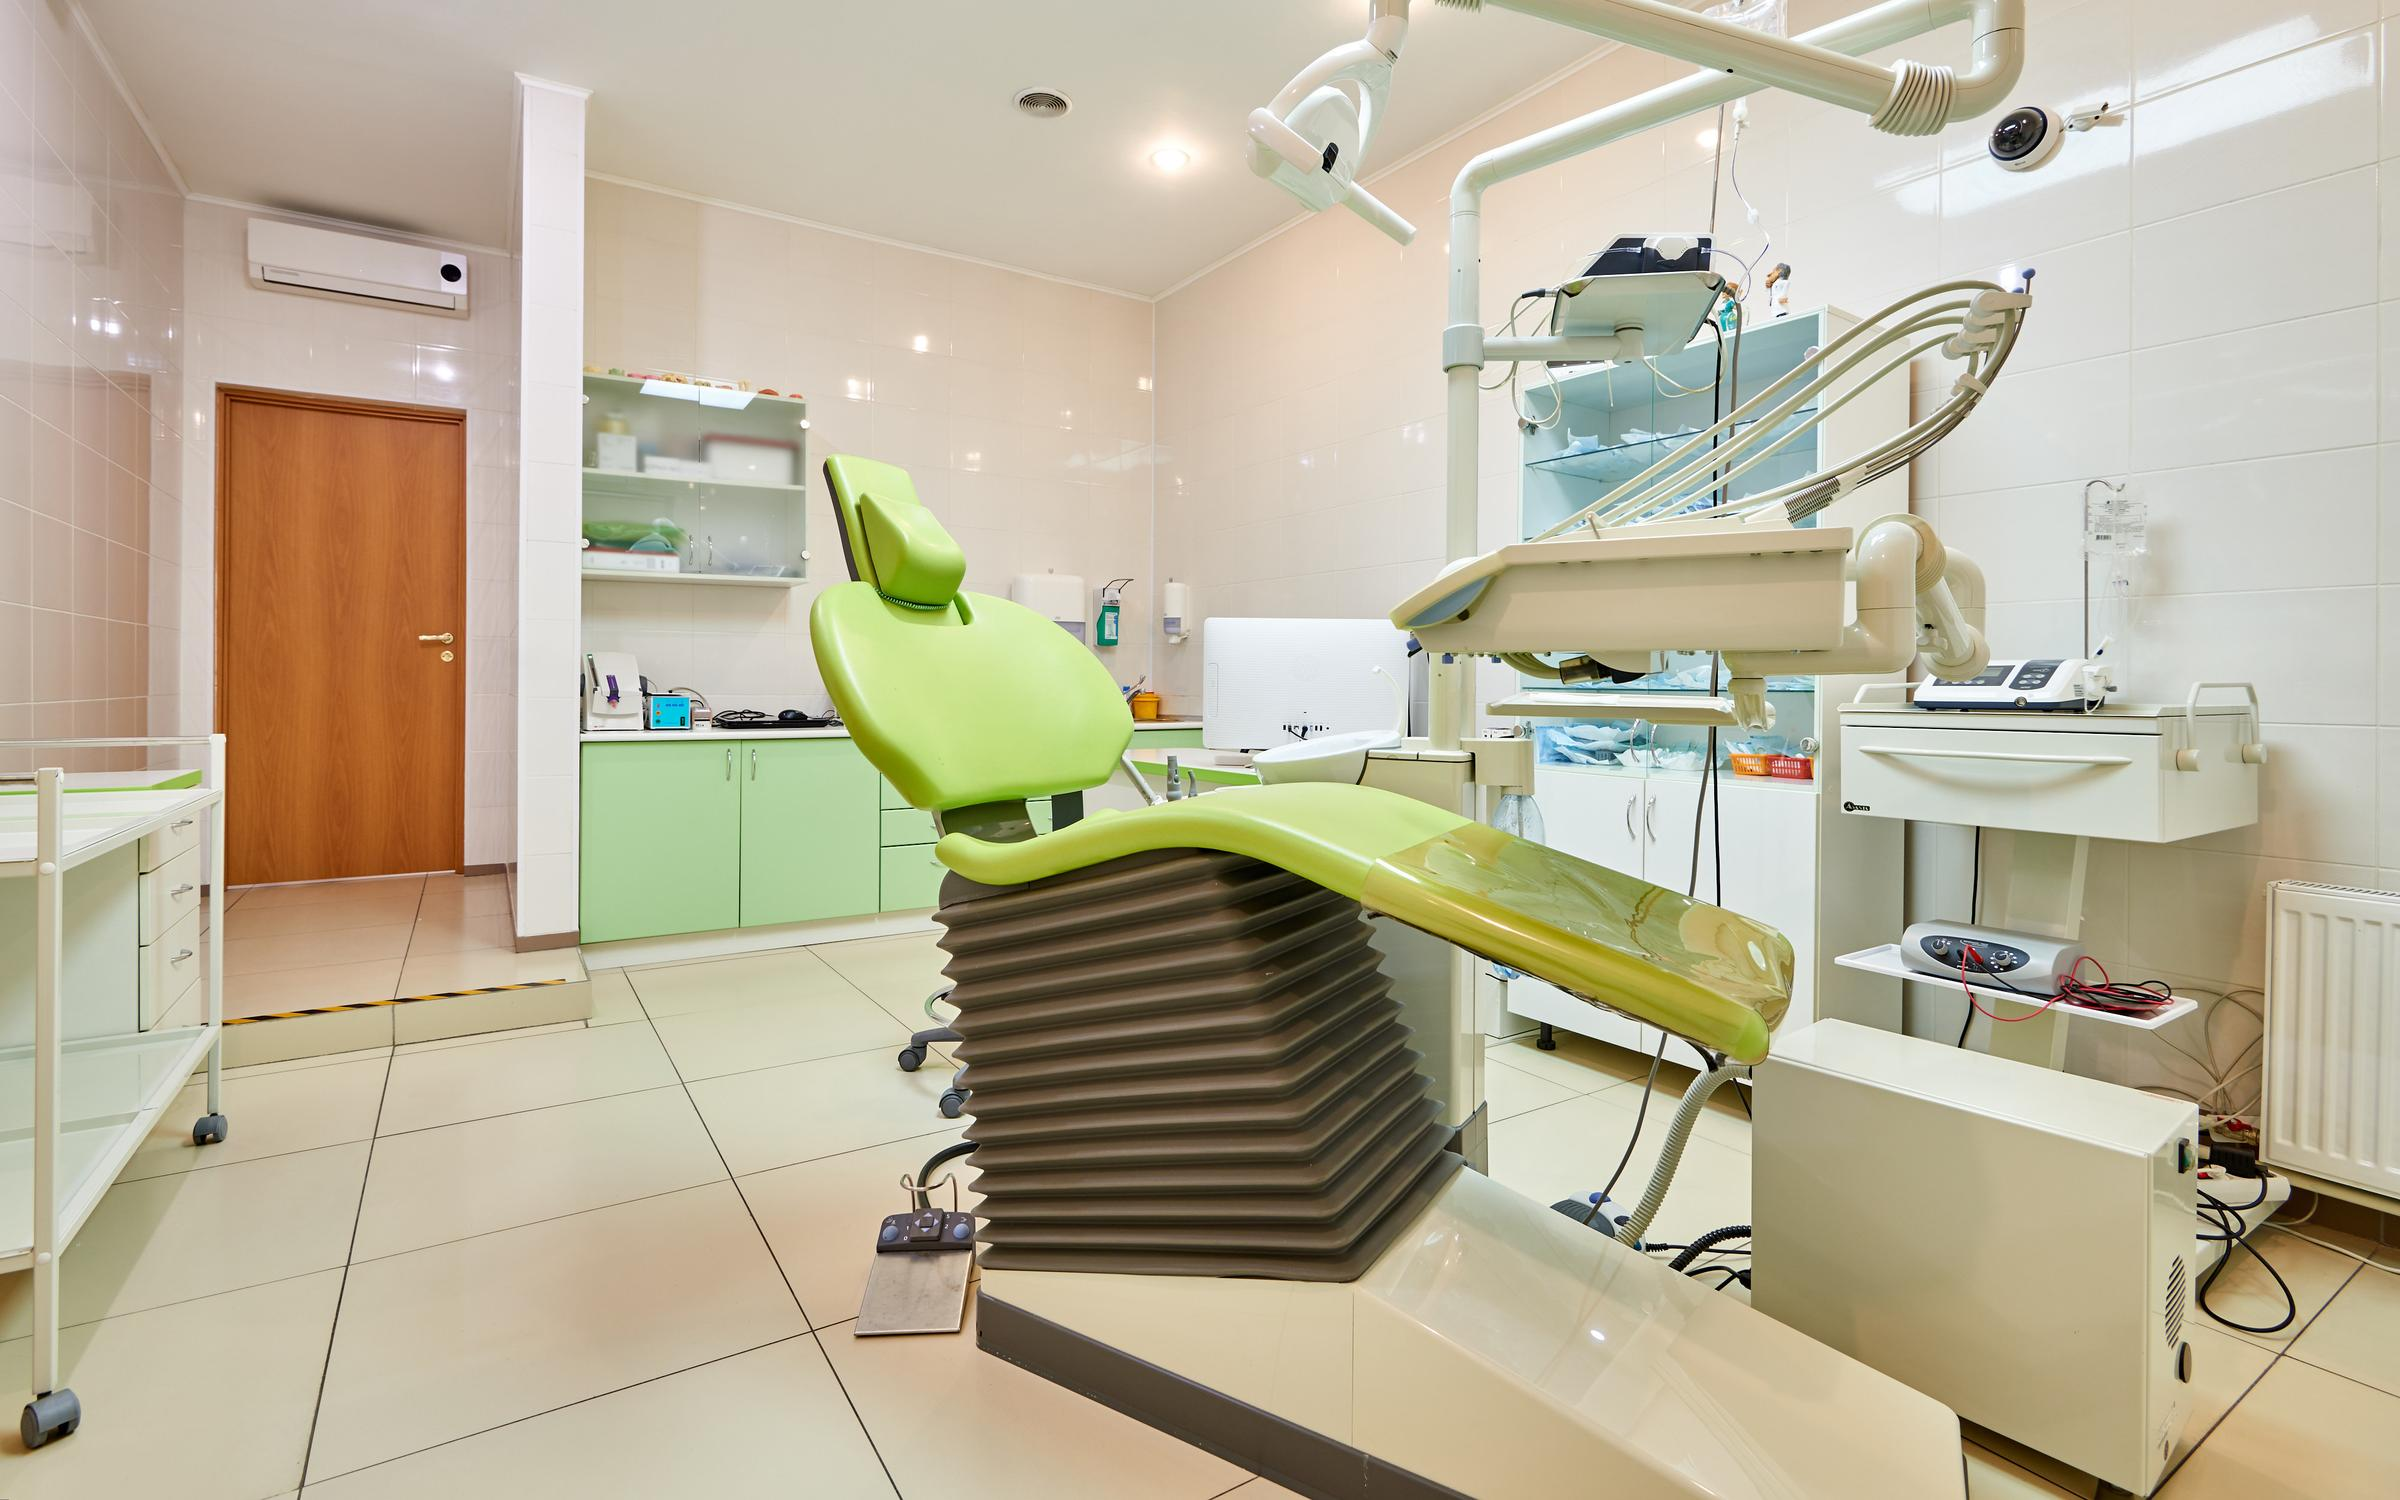 фотография Центра имплантации и стоматологии ИНТАН на проспекте Луначарского